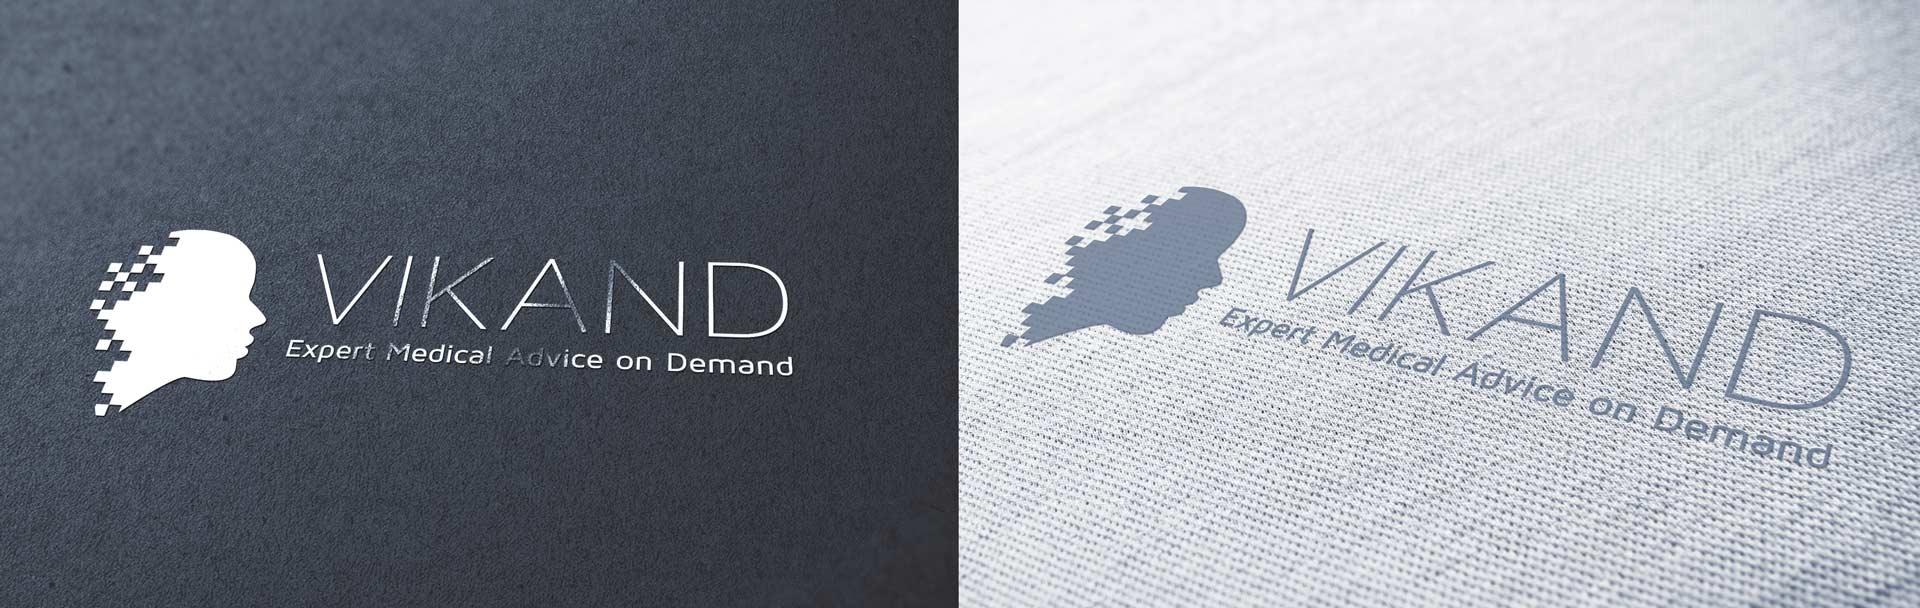 Vikand-logo-mockups